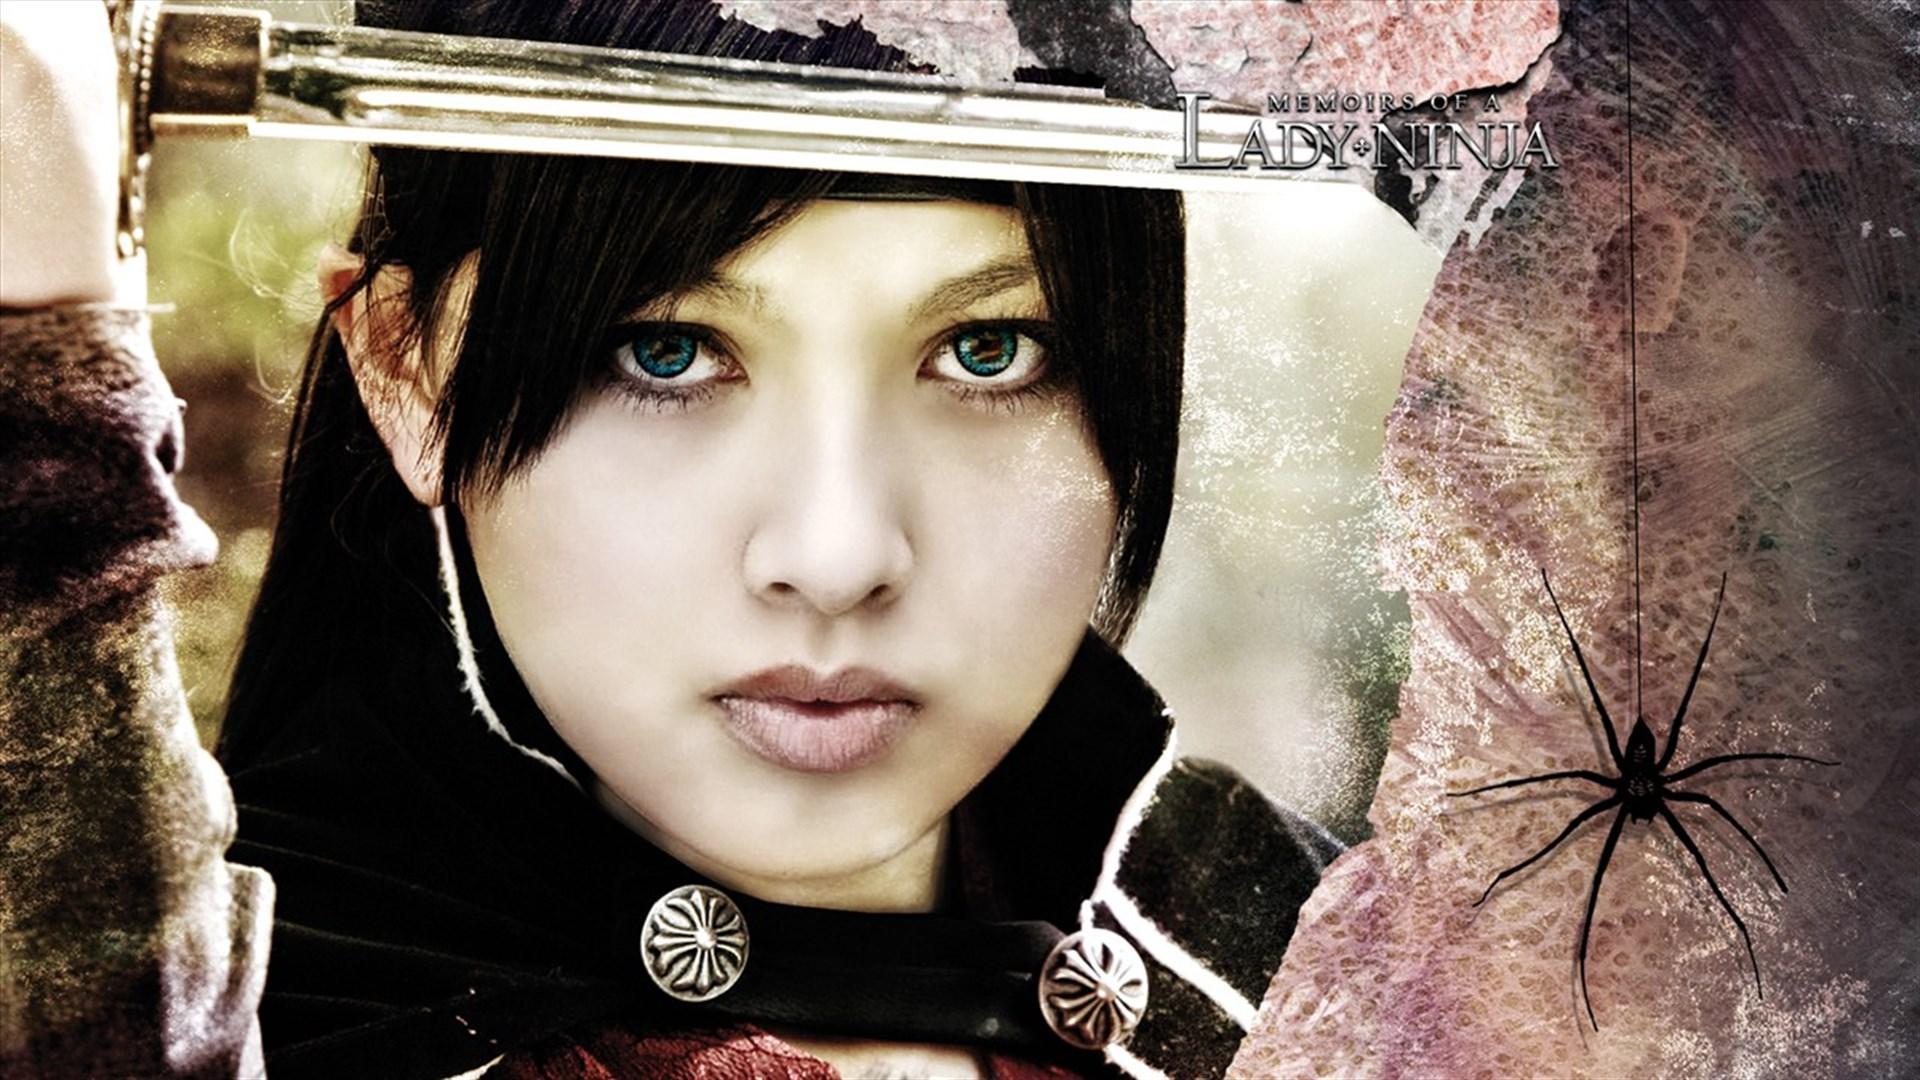 download video memoirs of a lady ninja 2009